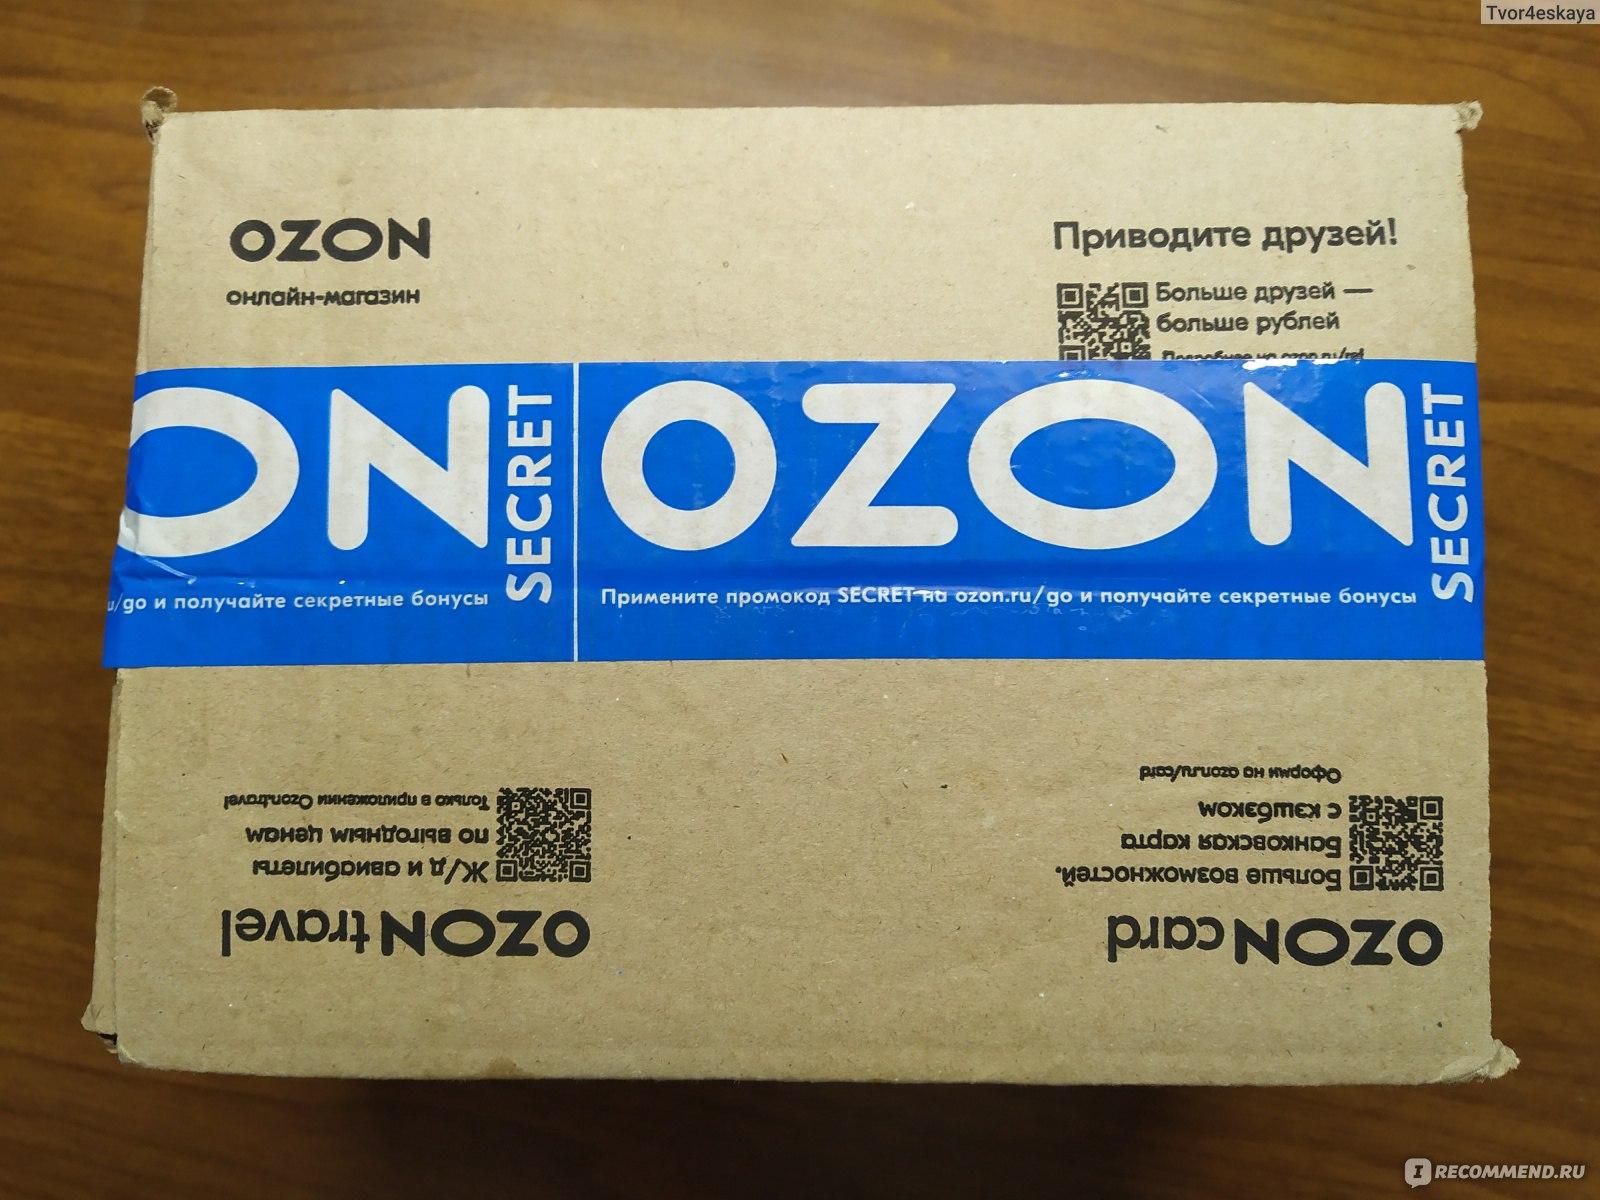 Ozon Ru Интернет Магазин Каталог Товаров Самара